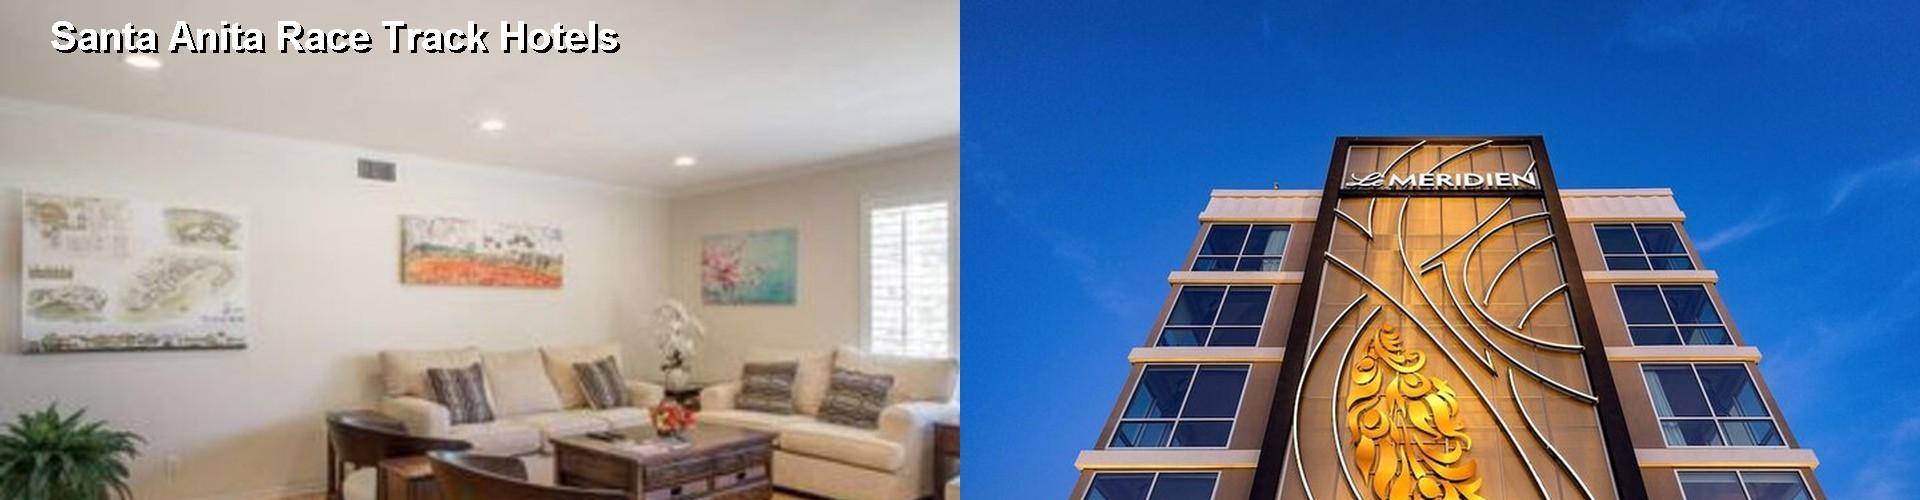 50 Best Hotels Near Santa Anita Race Track In Arcadia Ca